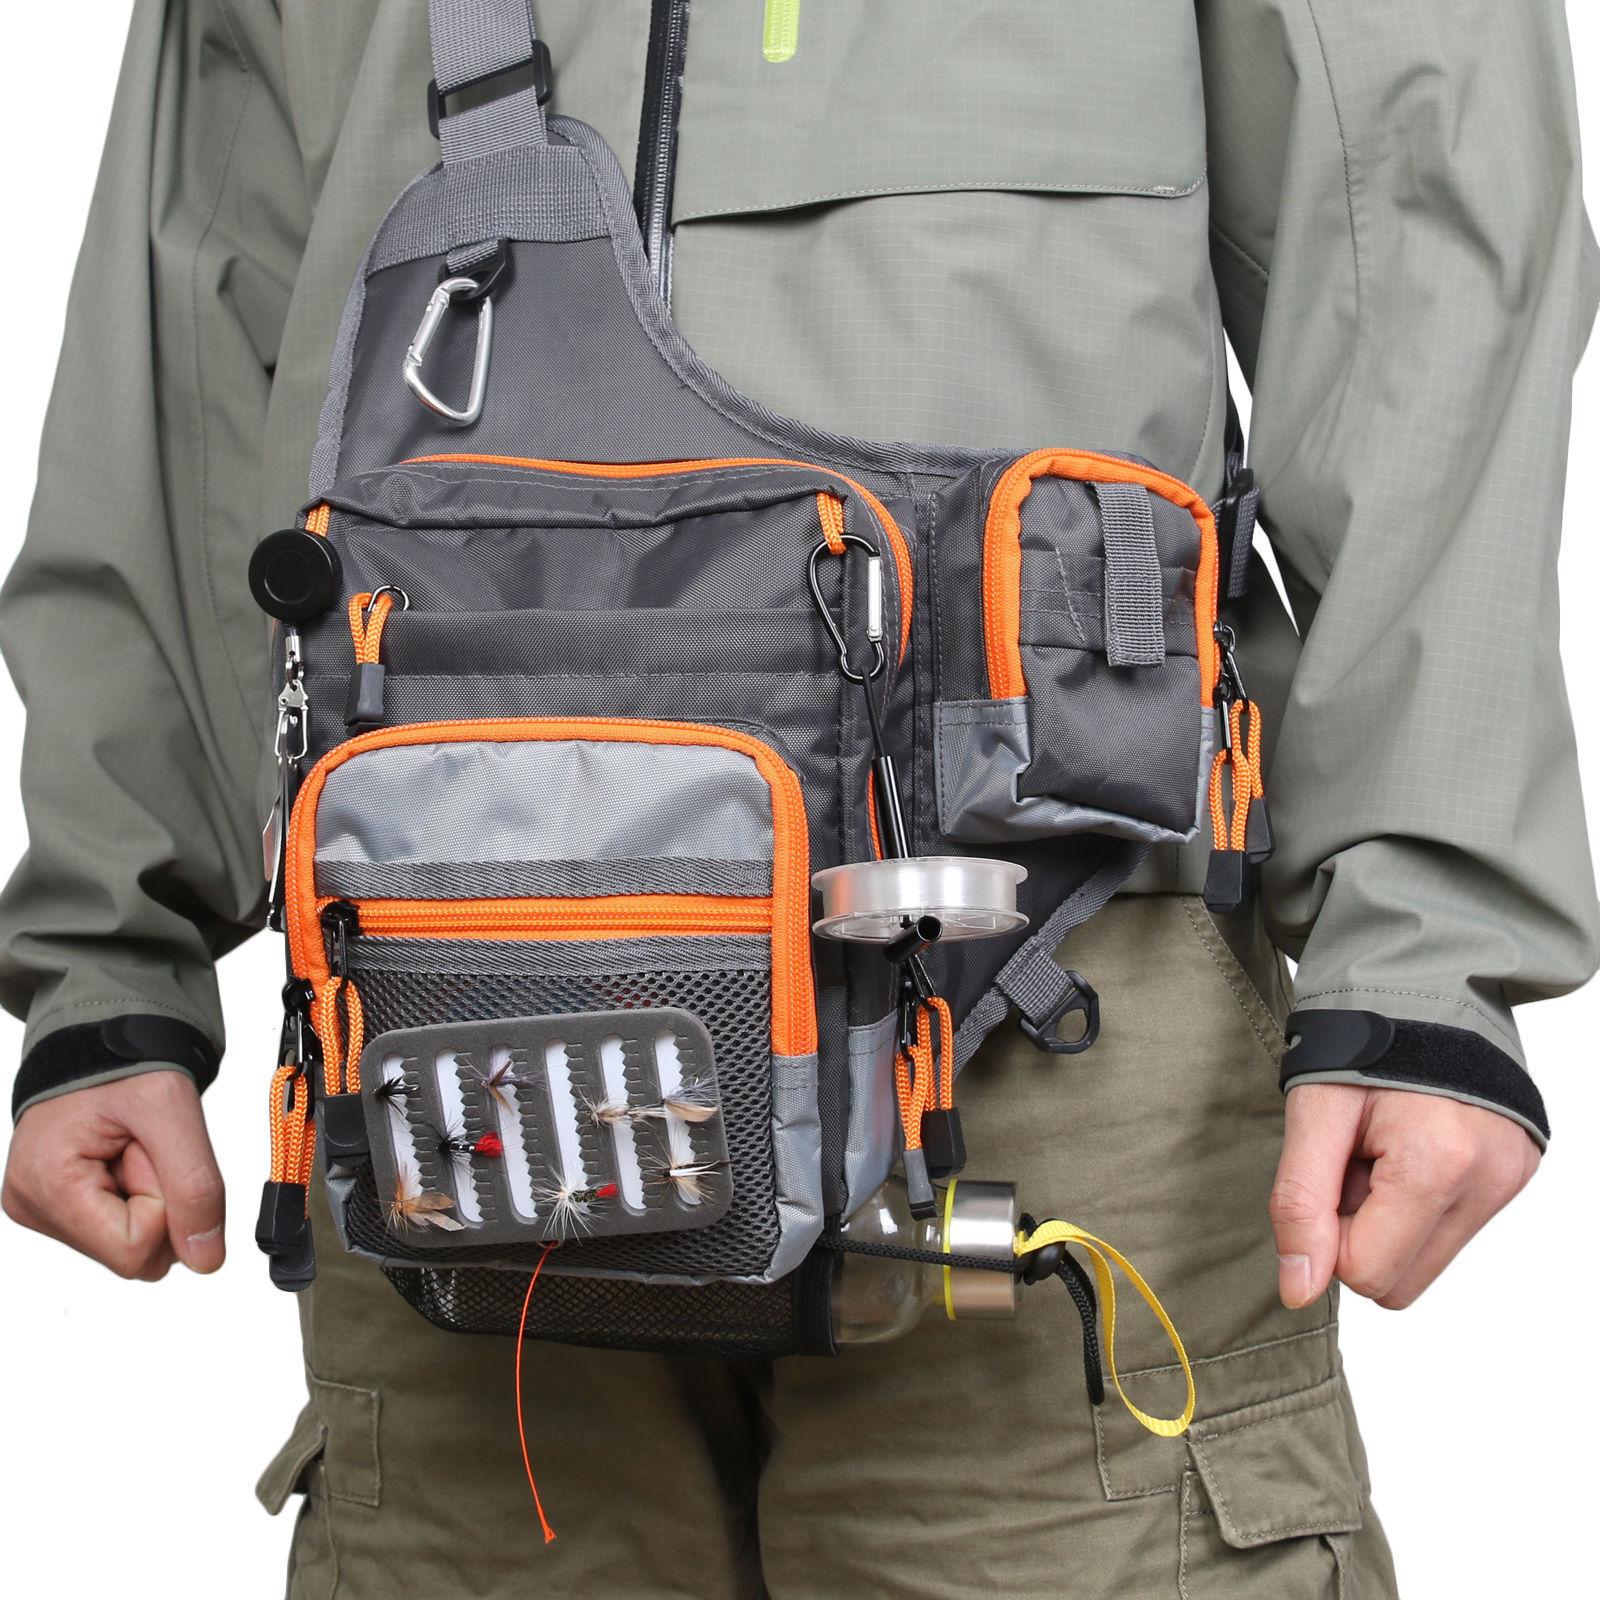 Waterproof Fly Fishing Bag Multi Function Waist Bag Pack Sling Shoulder Bag SA